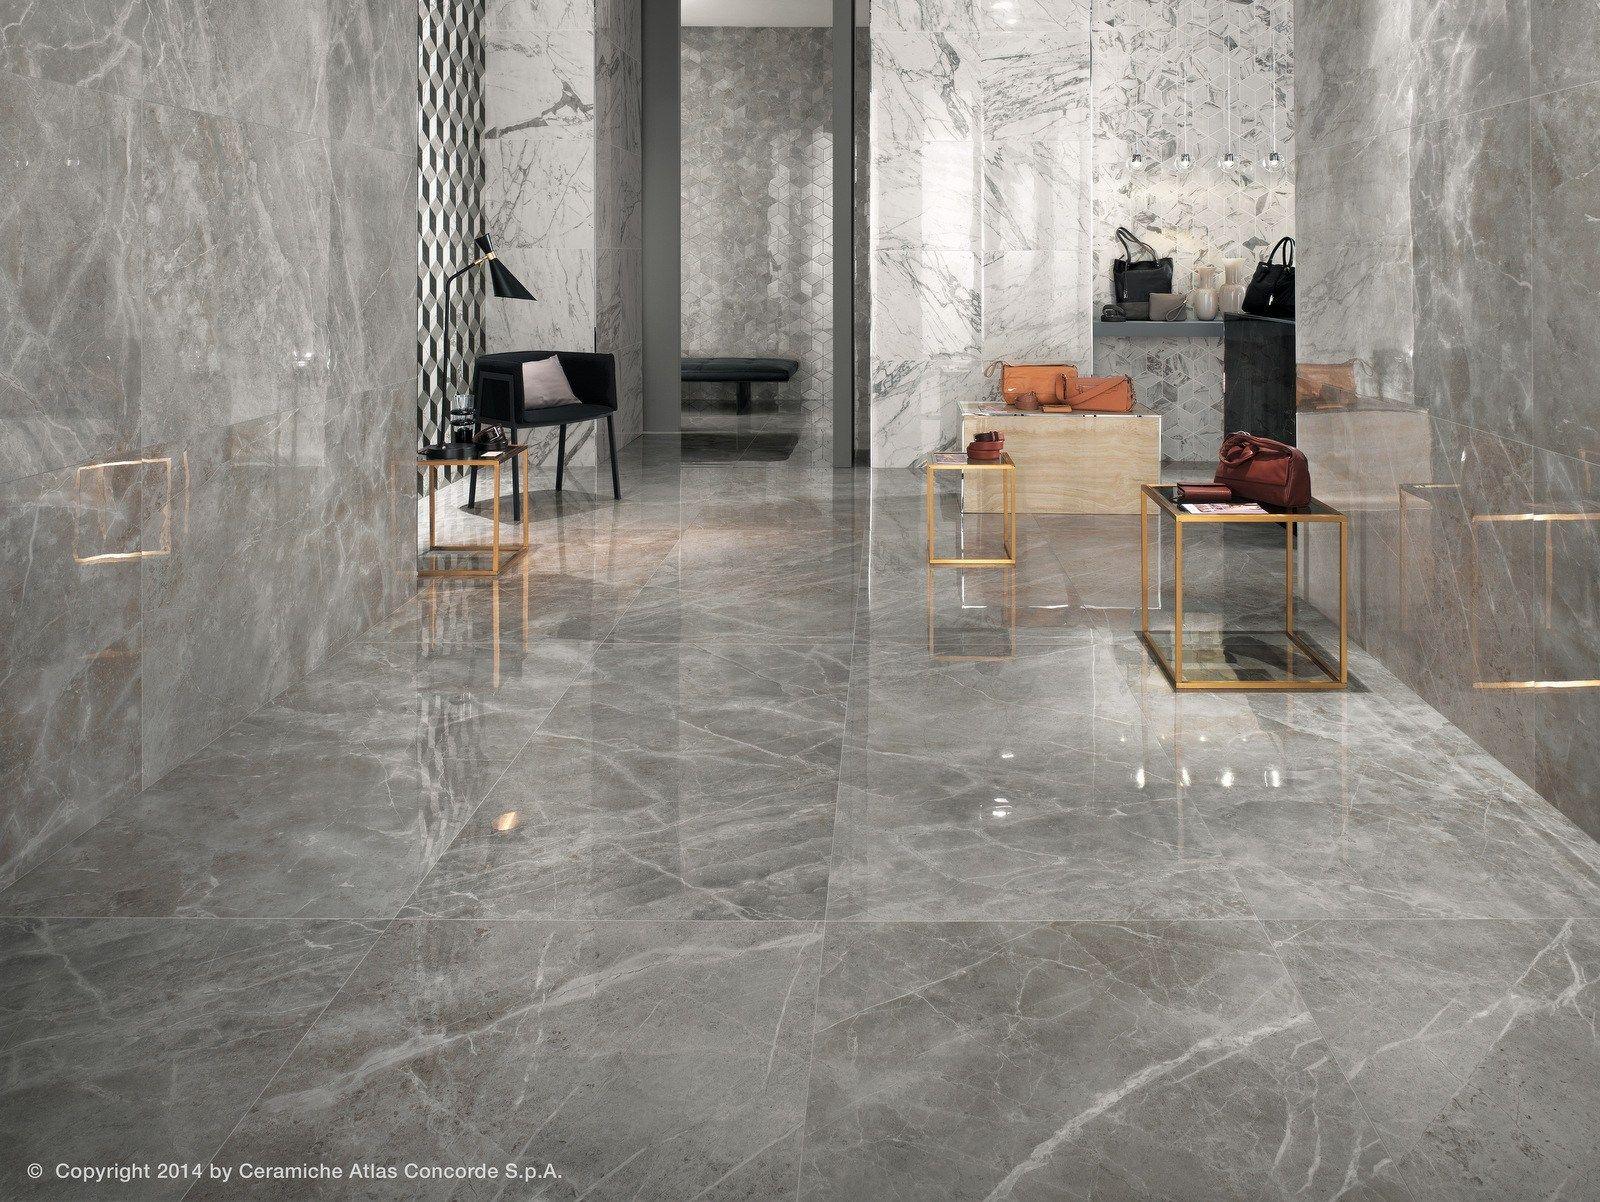 Indooroutdoor porcelain stoneware floor tiles with marble effect indooroutdoor porcelain stoneware floor tiles with marble effect marvel pro porcelain stoneware collection by dailygadgetfo Gallery